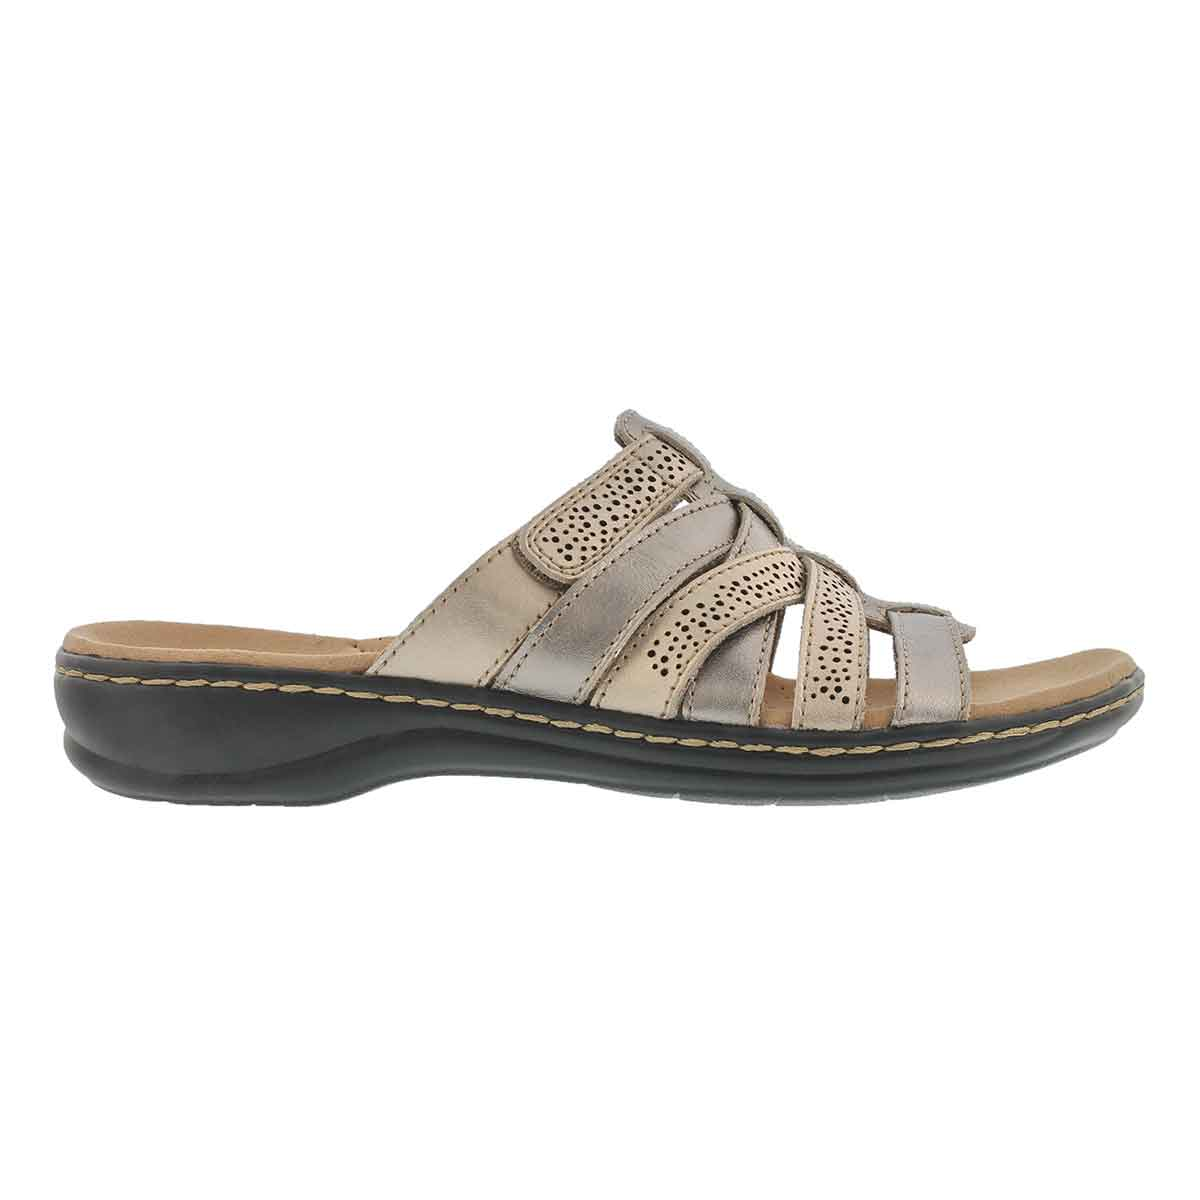 Lds Leisa Field mtlc casual slide sandal